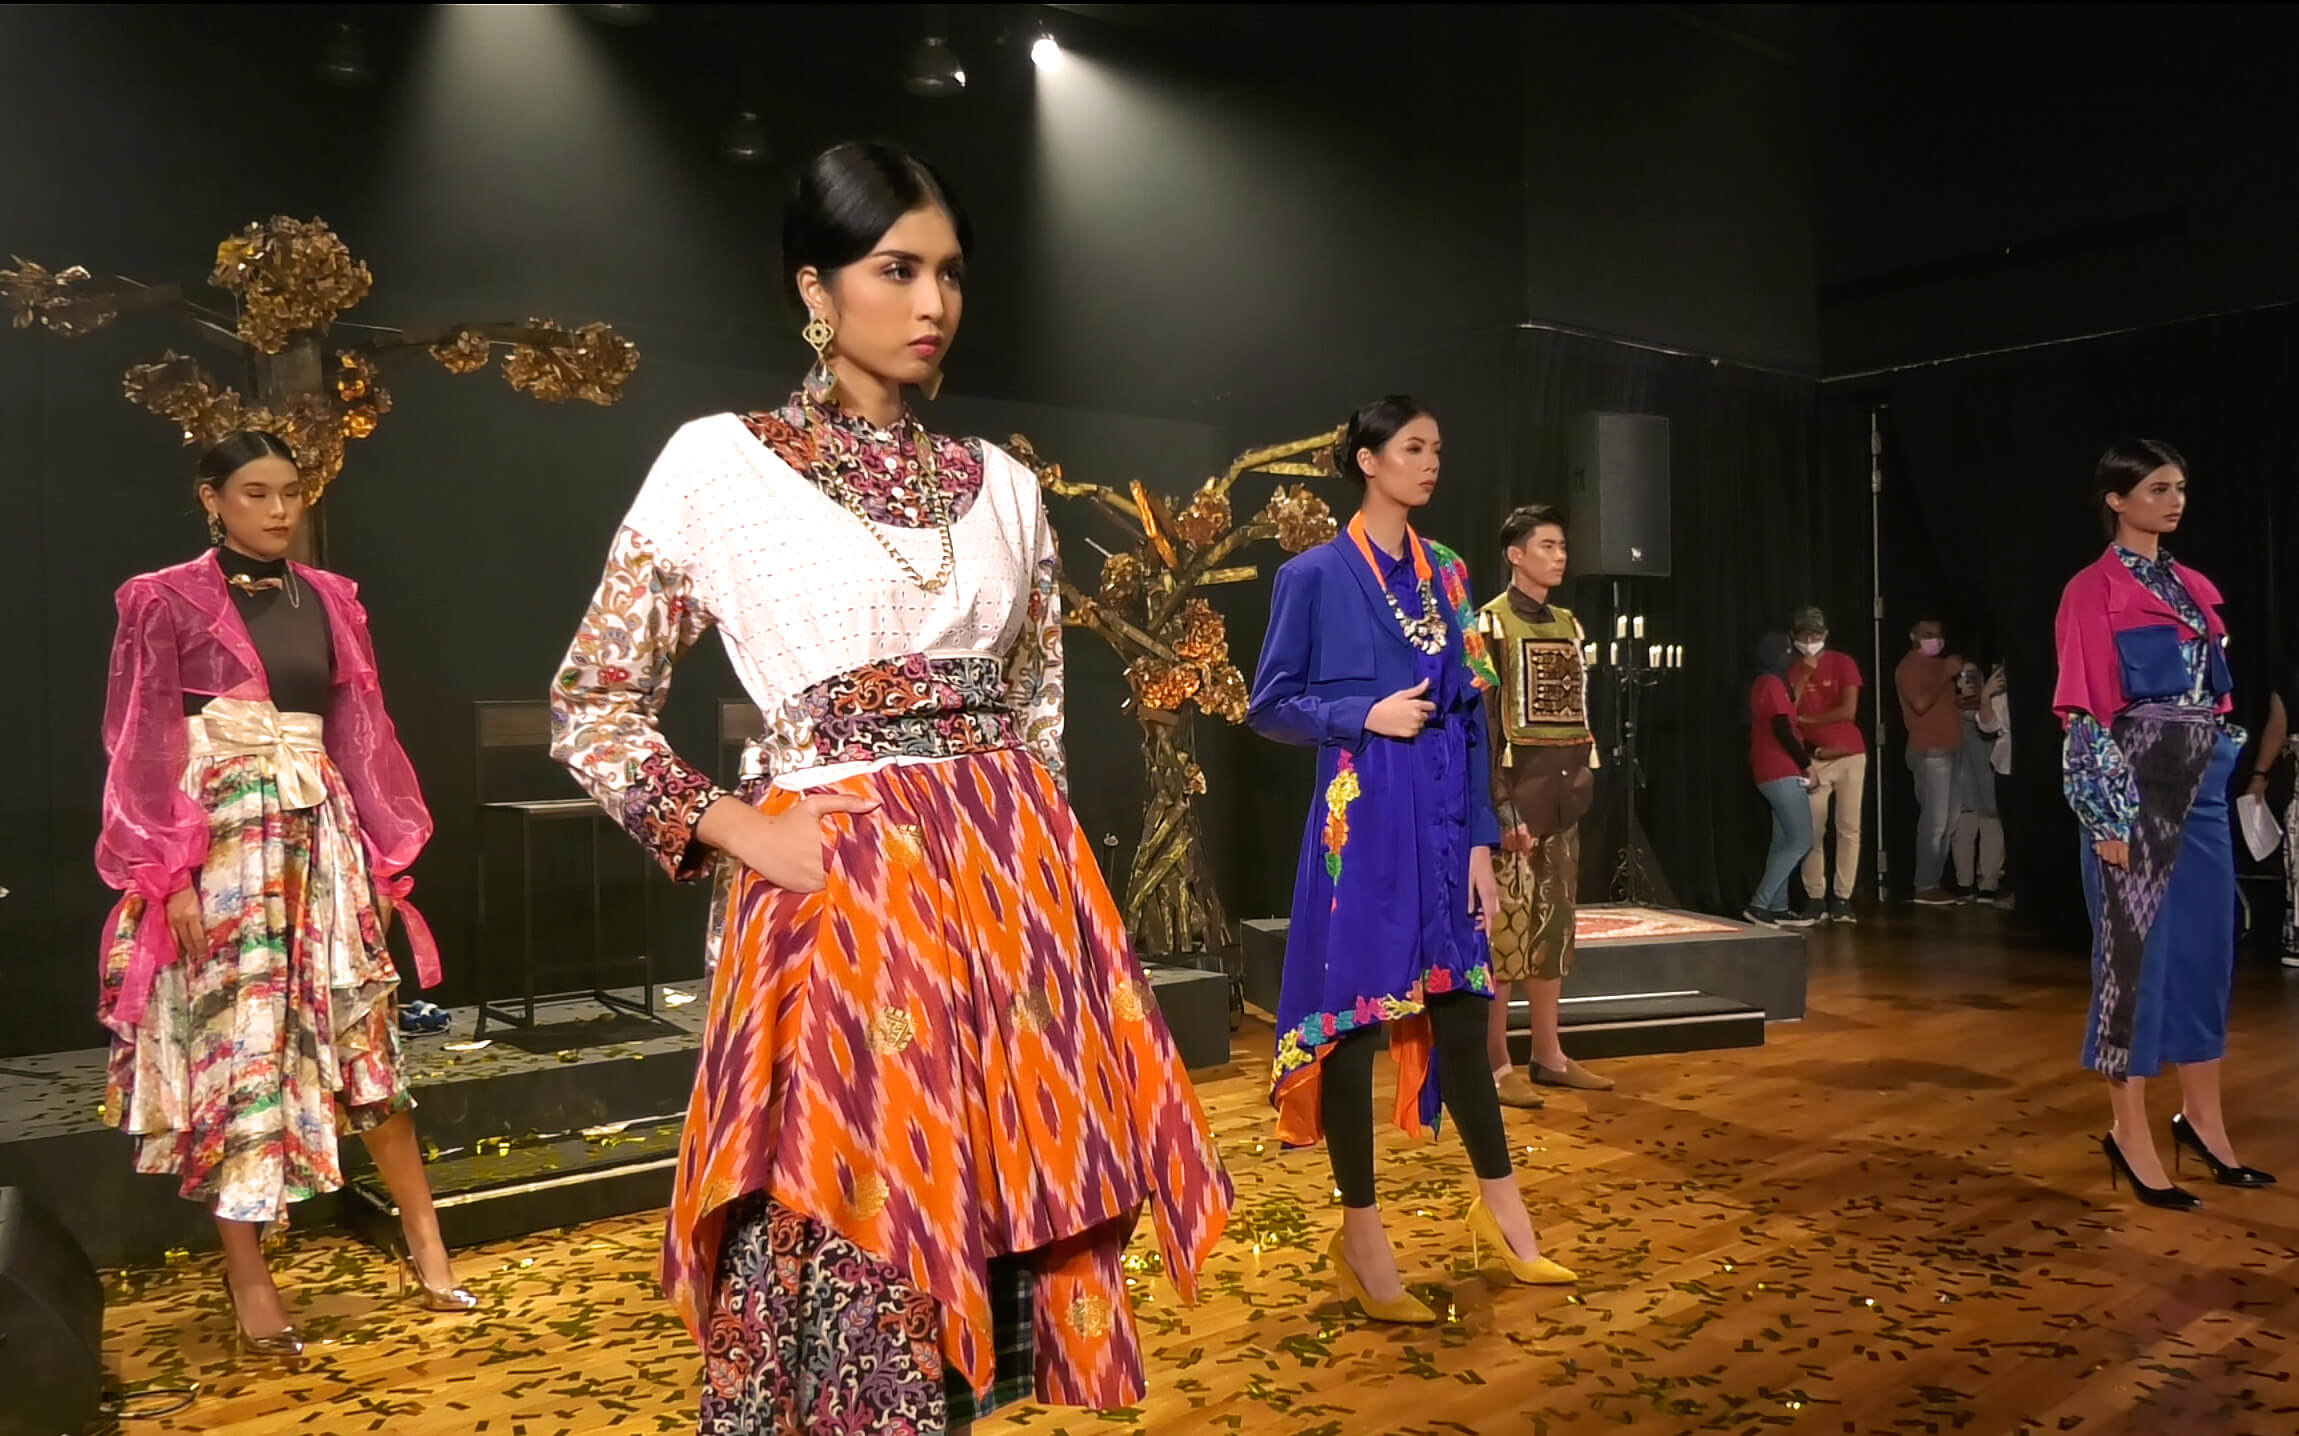 Arab Street URA Raffles Recreating the Textile Culture Collaboration from One Kampung Glam Cahaya Ramadan Live Stream Fashion Show 8